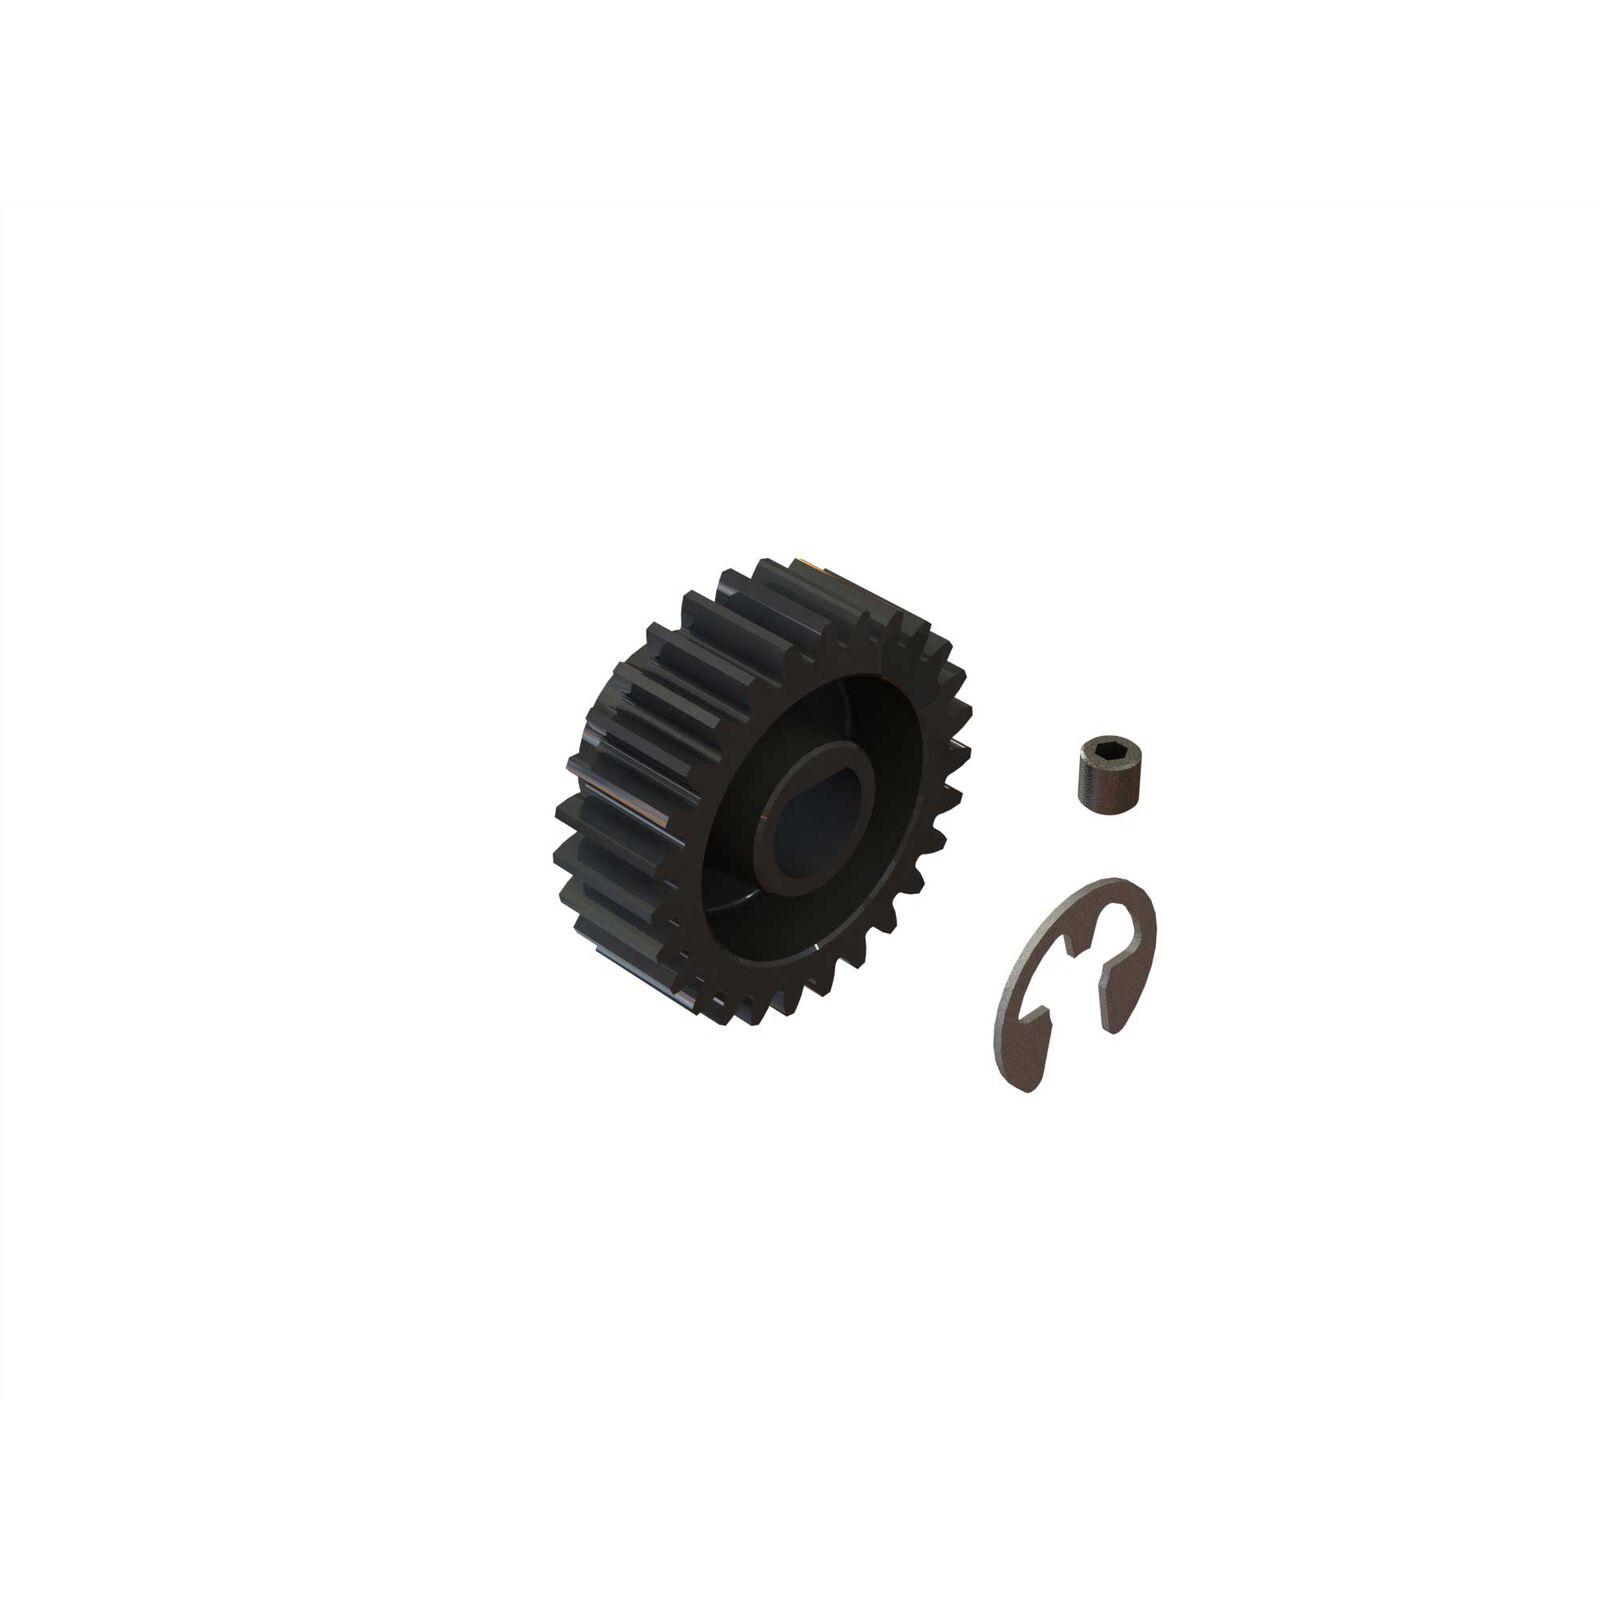 27T Mod1 Safe-D8 Pinion Gear